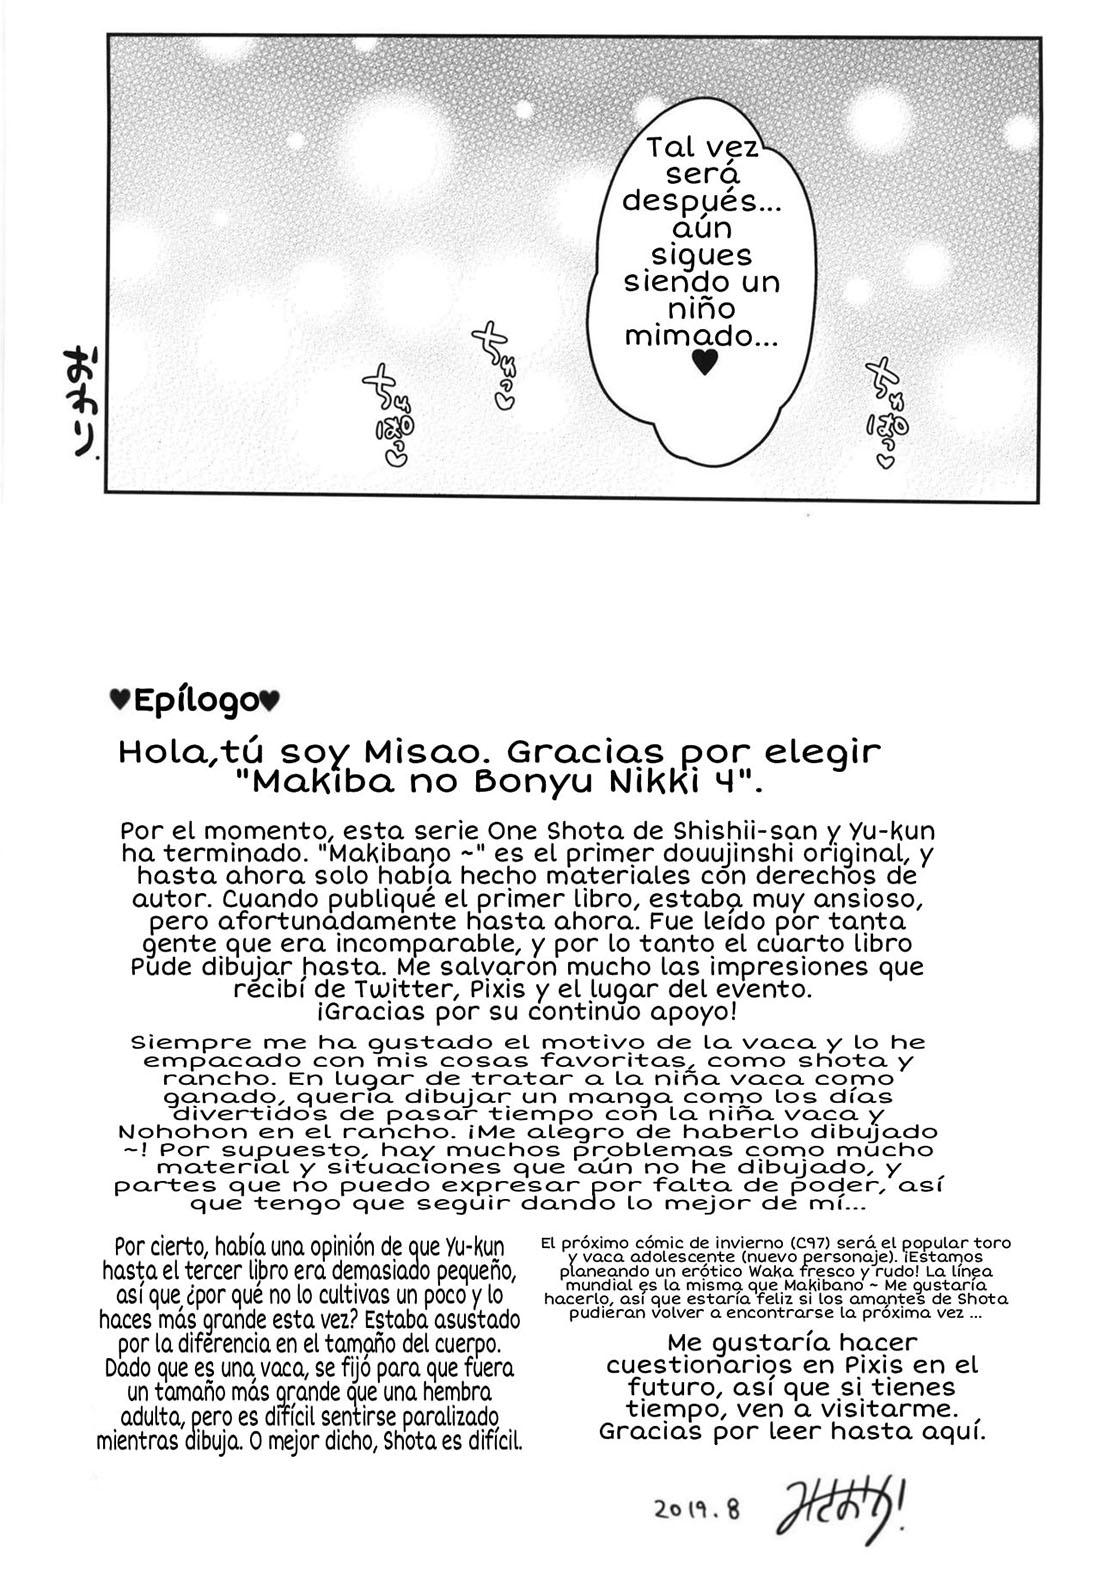 MAKIBA no Bonyuu Nikki parte 4